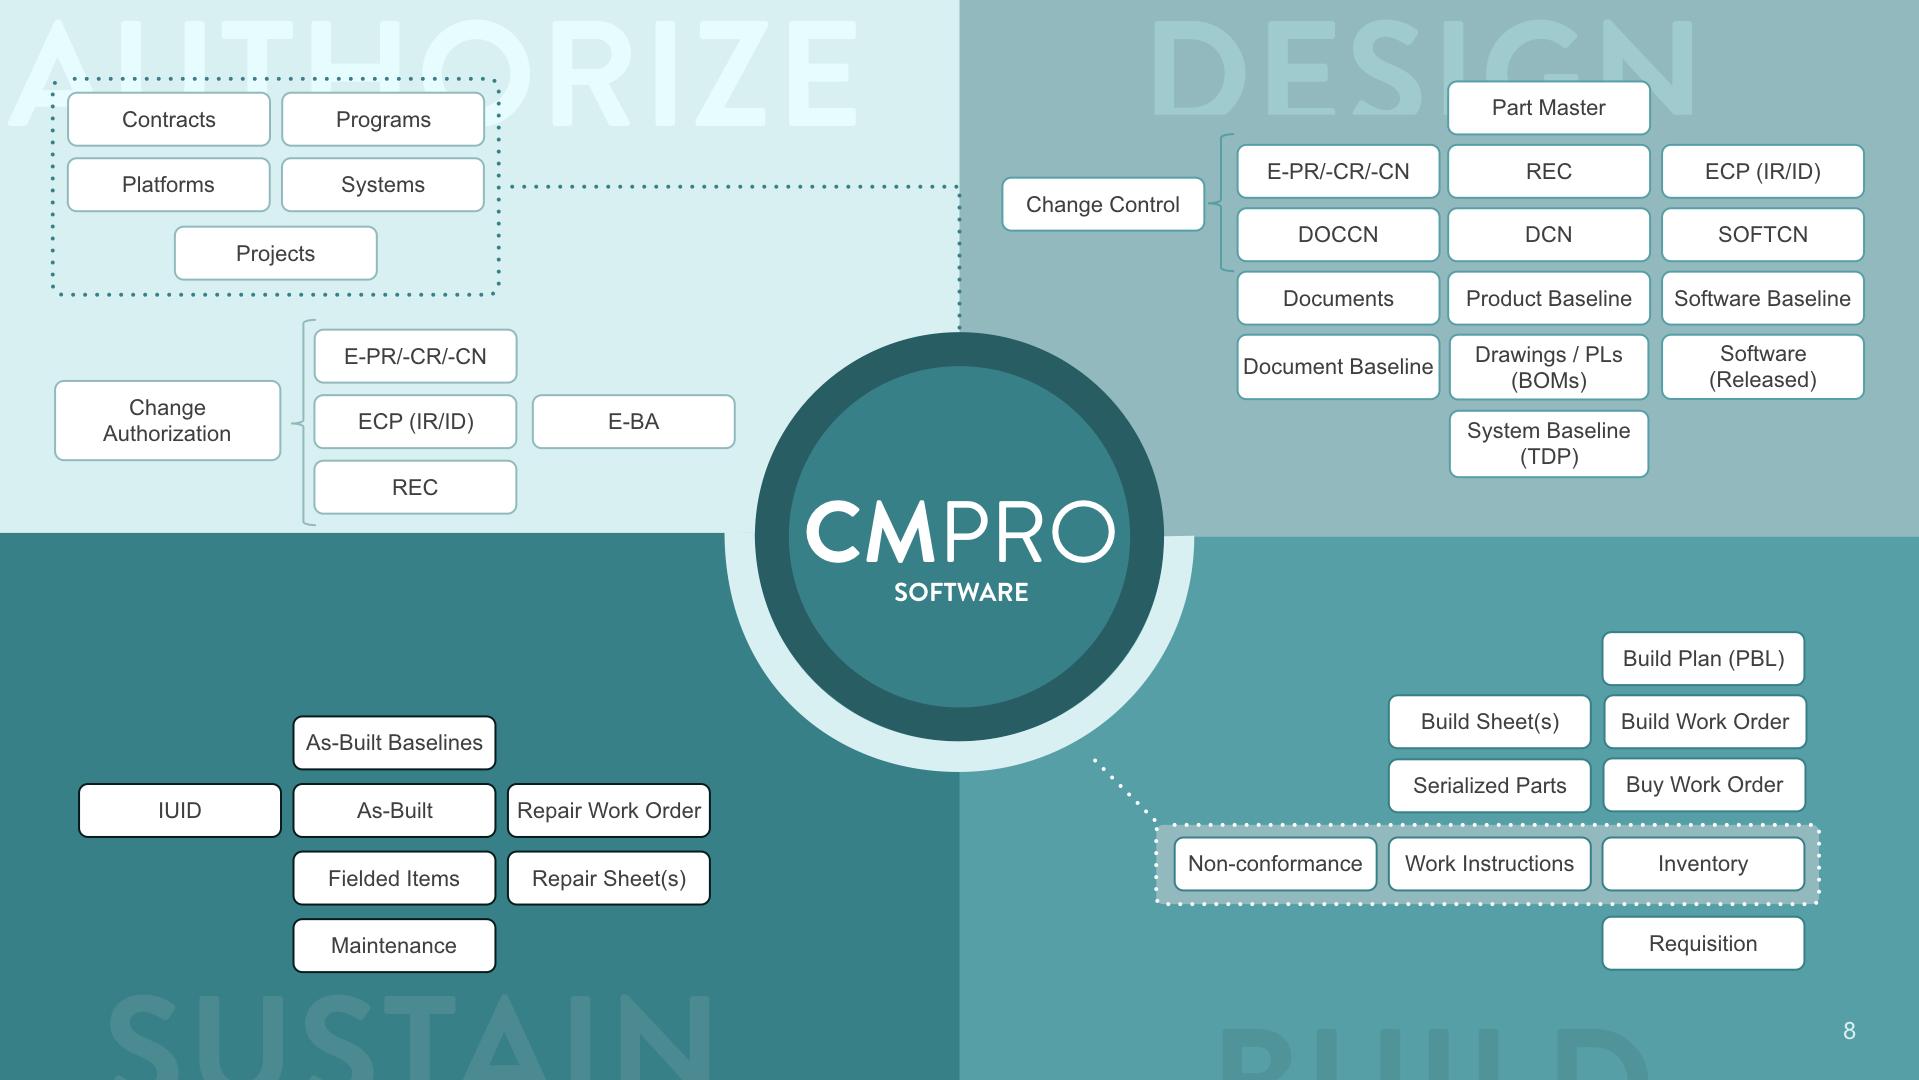 CMPRO Demo - CMPRO-authorize-create-build-sustain